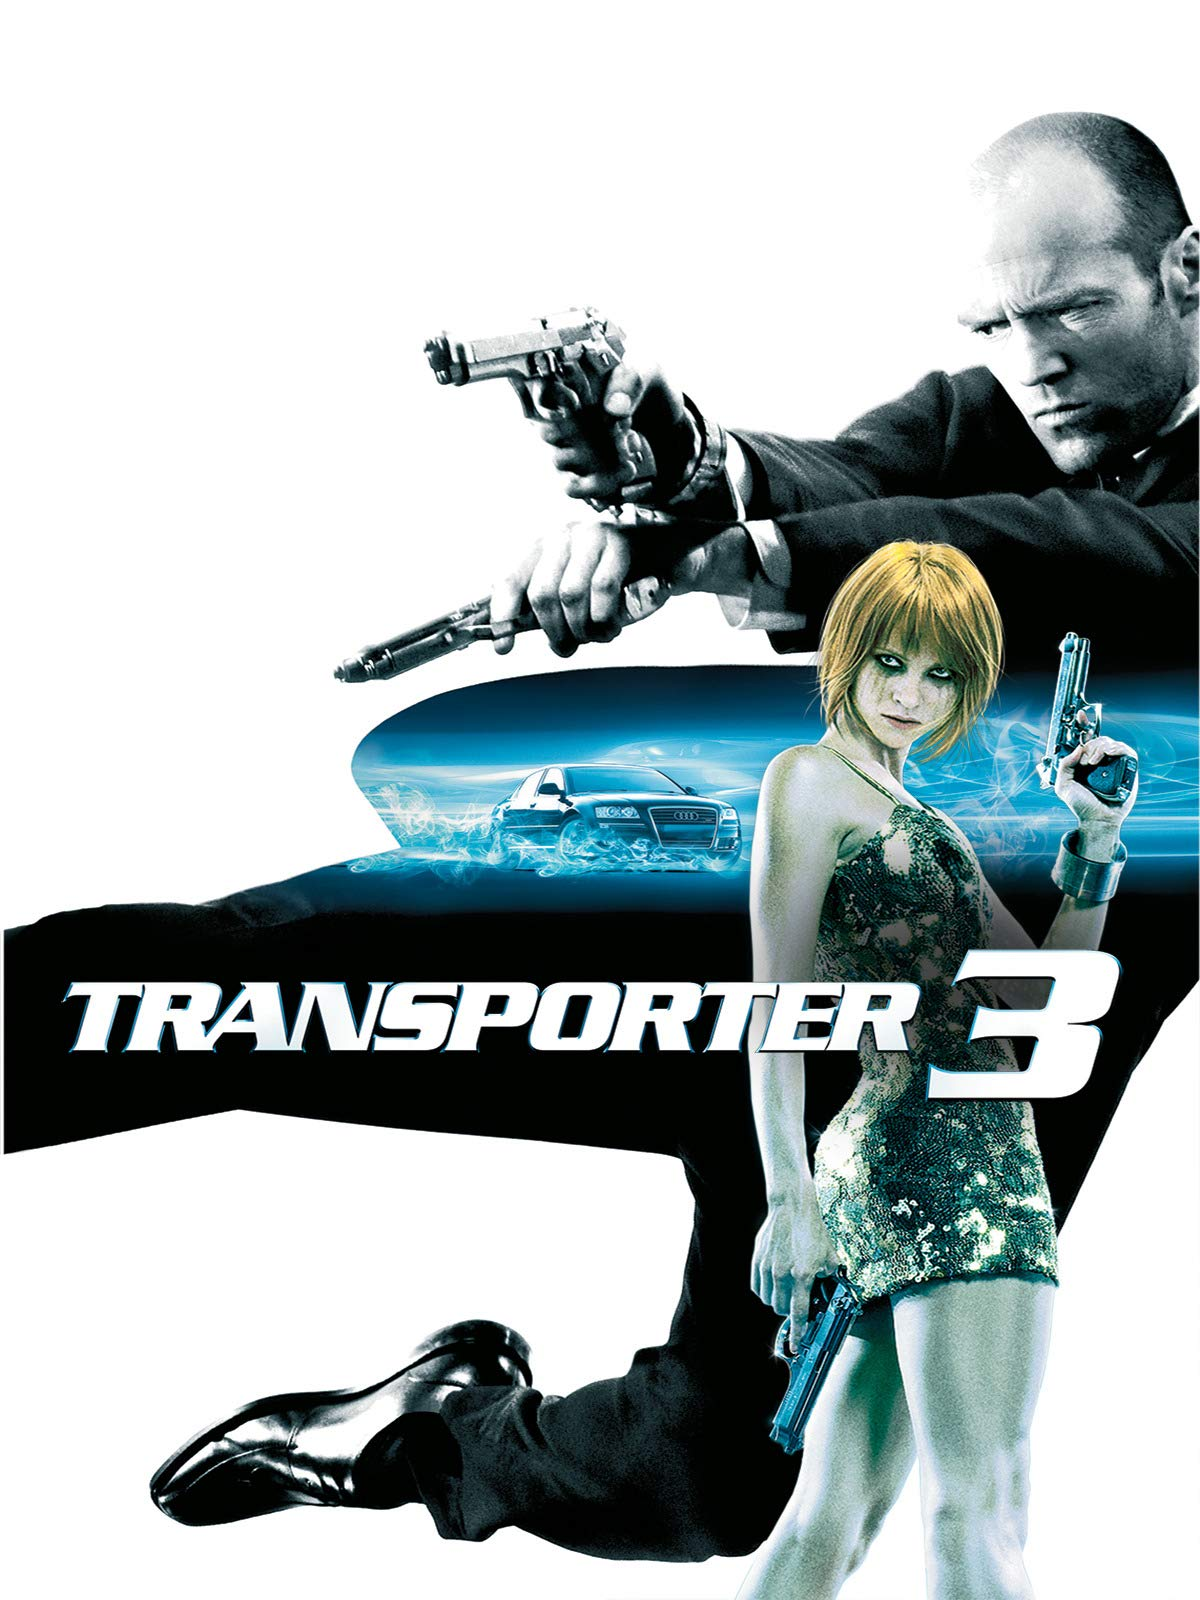 Transporter 3 on Amazon Prime Video UK